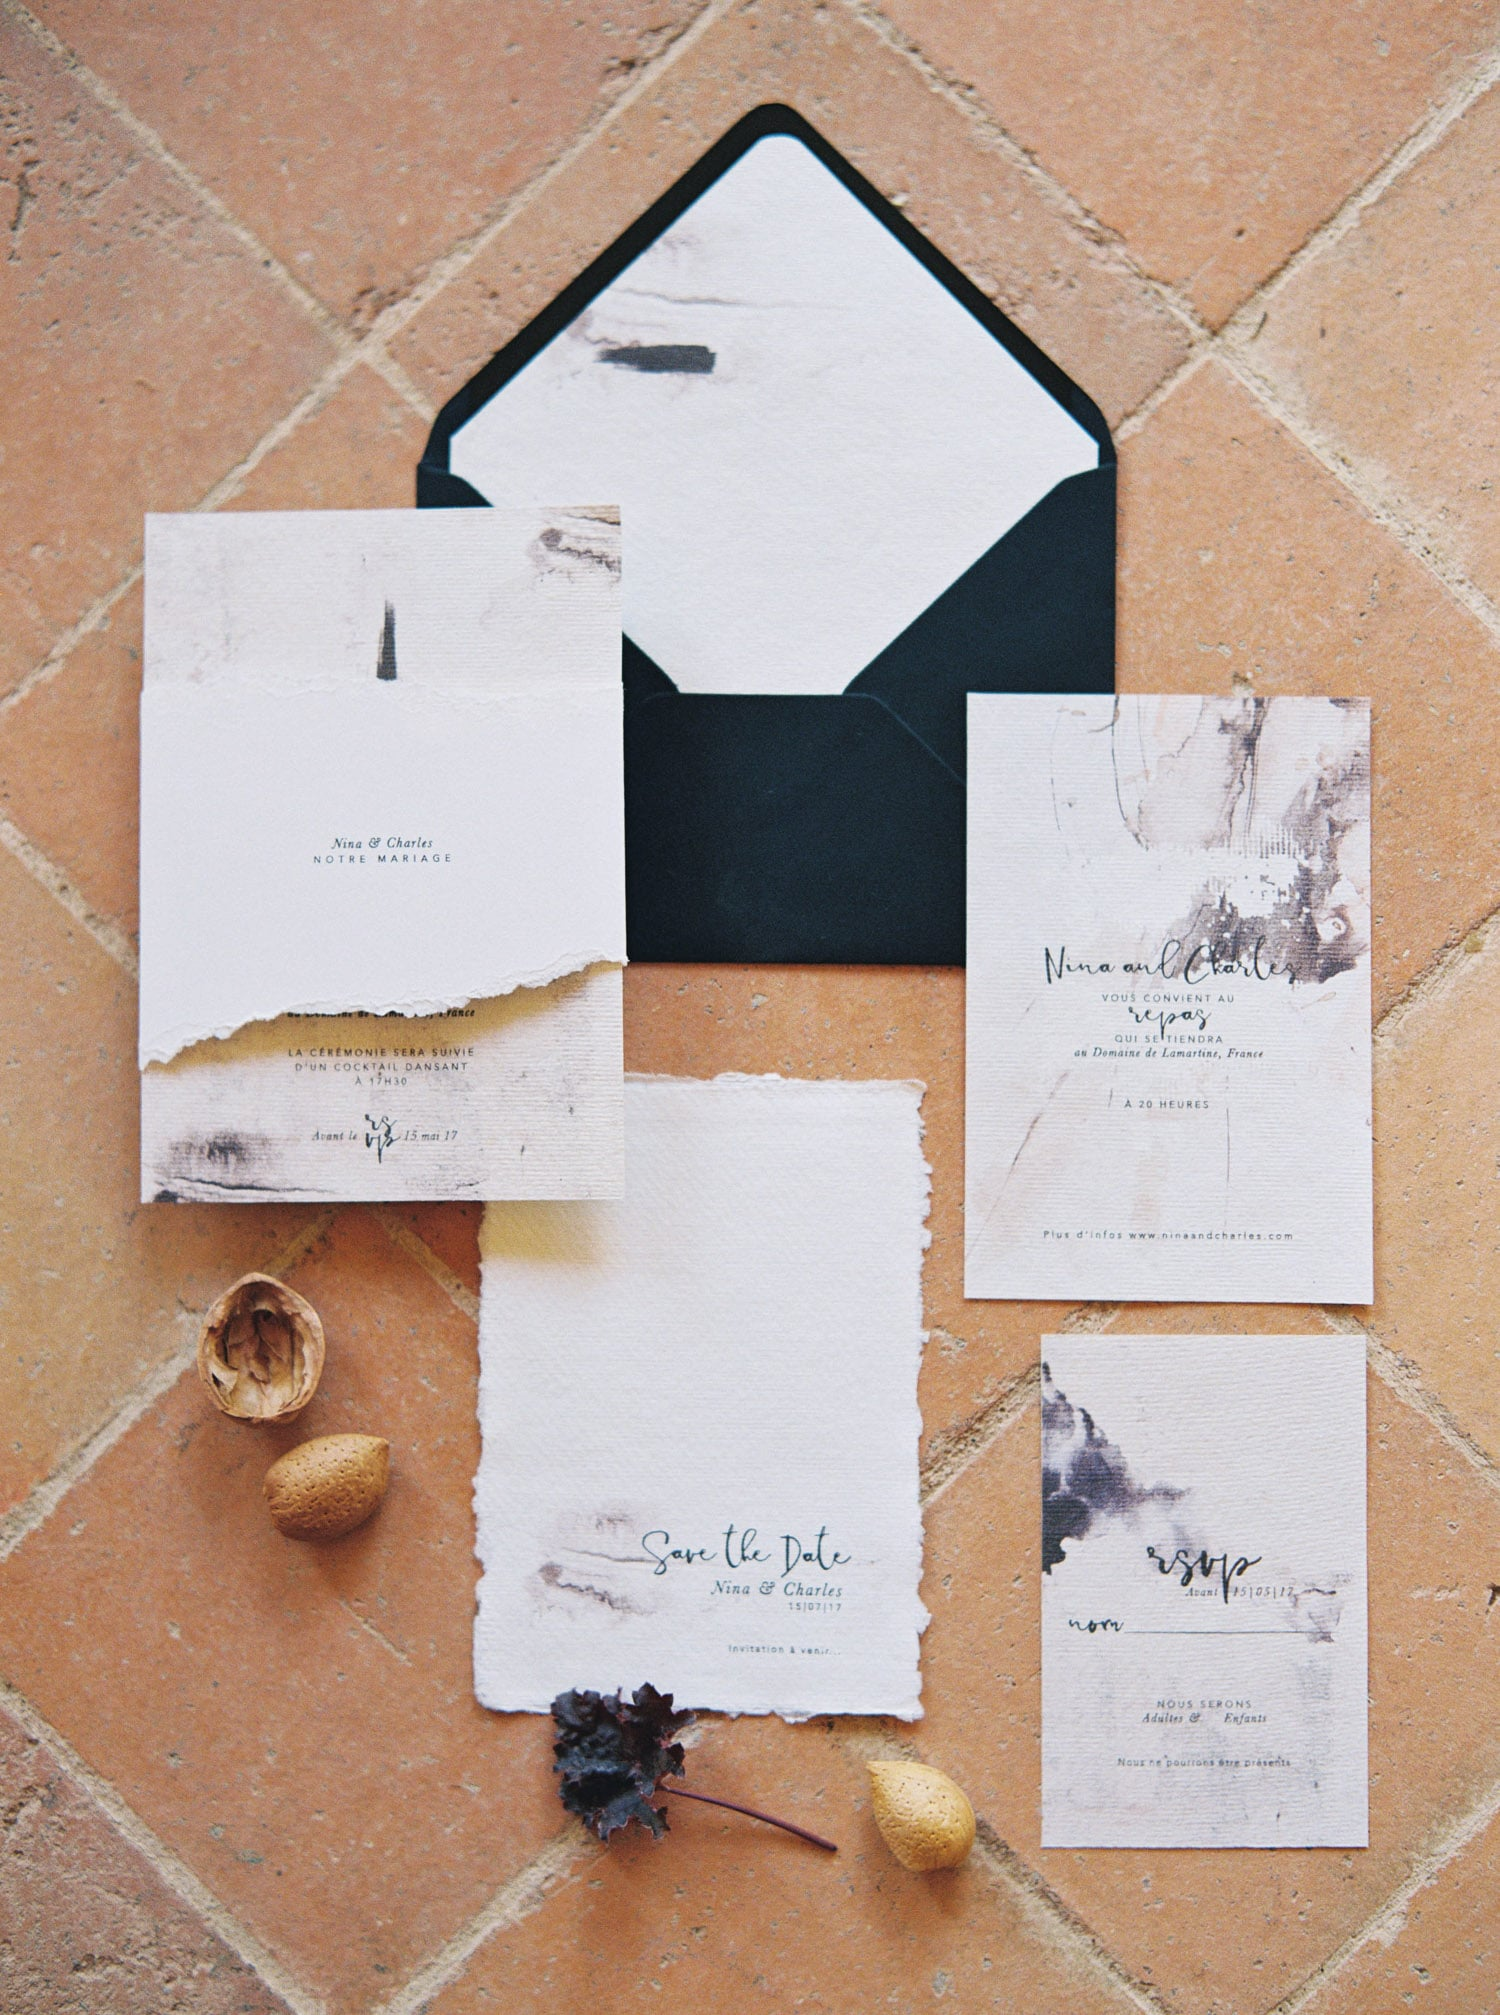 wedding stationary, modern invitation suite, graphikkart, veronique lorre, wedding flatlay, flatlay styling, wedding stylist, wedding designer